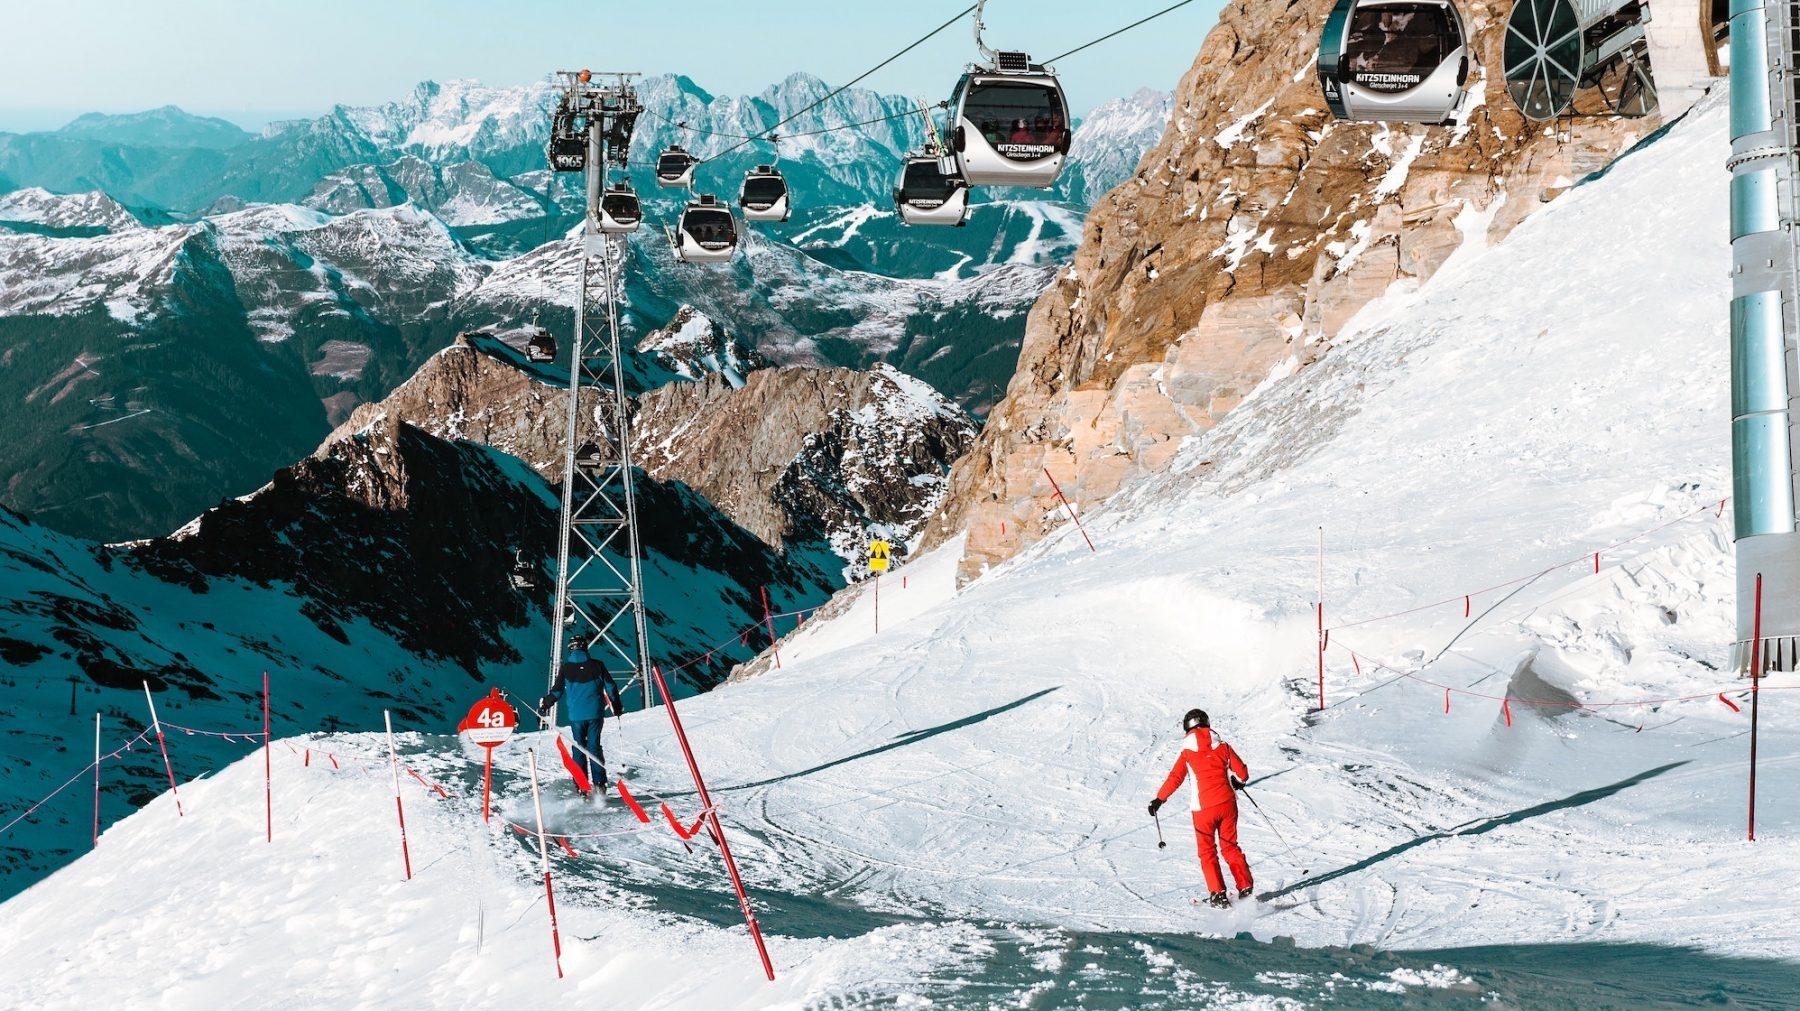 wintersport seizoen oostenrijk apres-ski